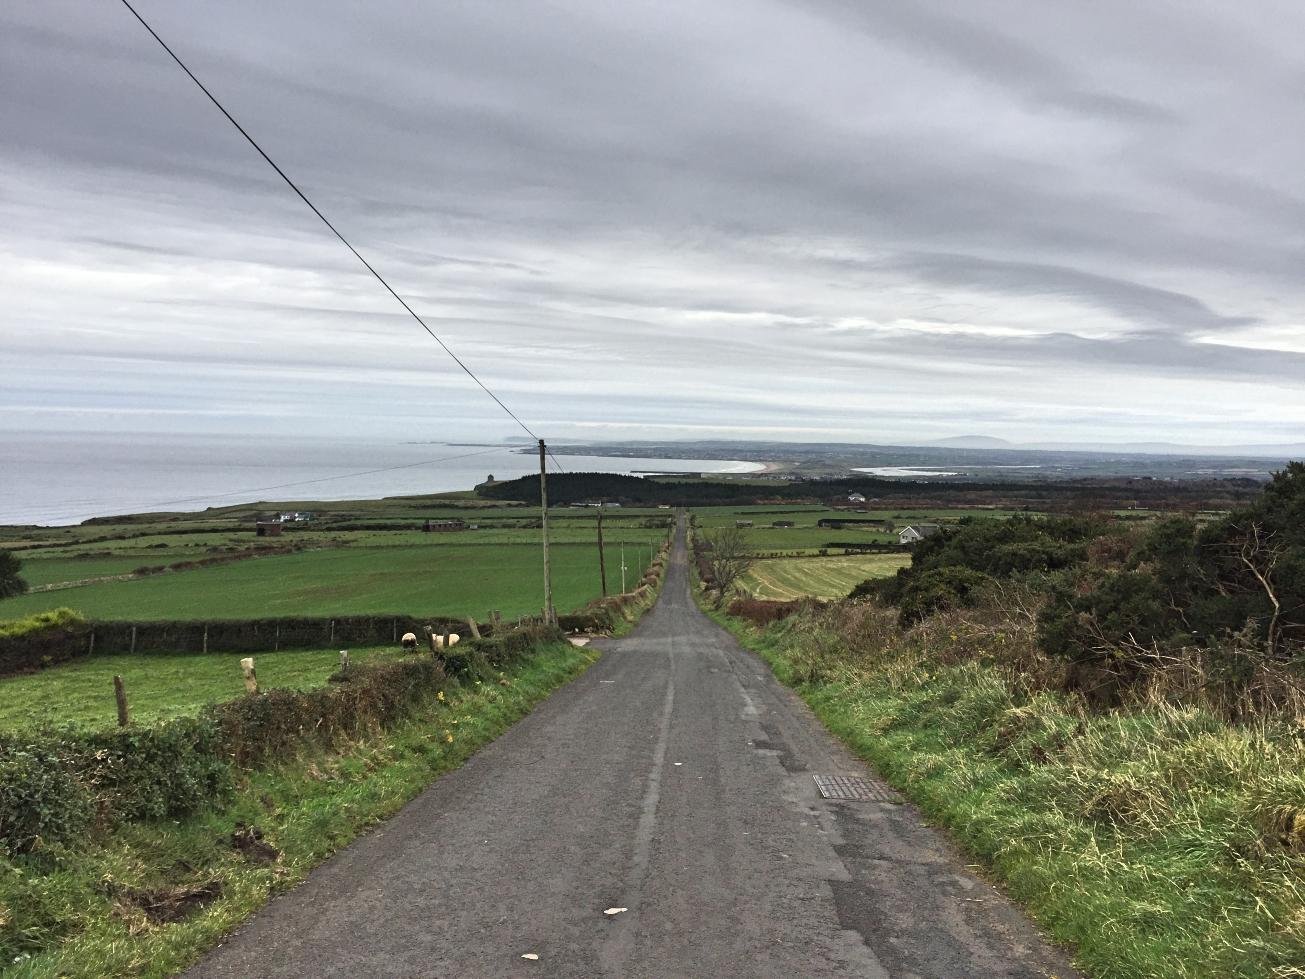 limavady_binevenagh_gortmore_view__niexplorer_ni_explorer_northern_ireland (24).jpg